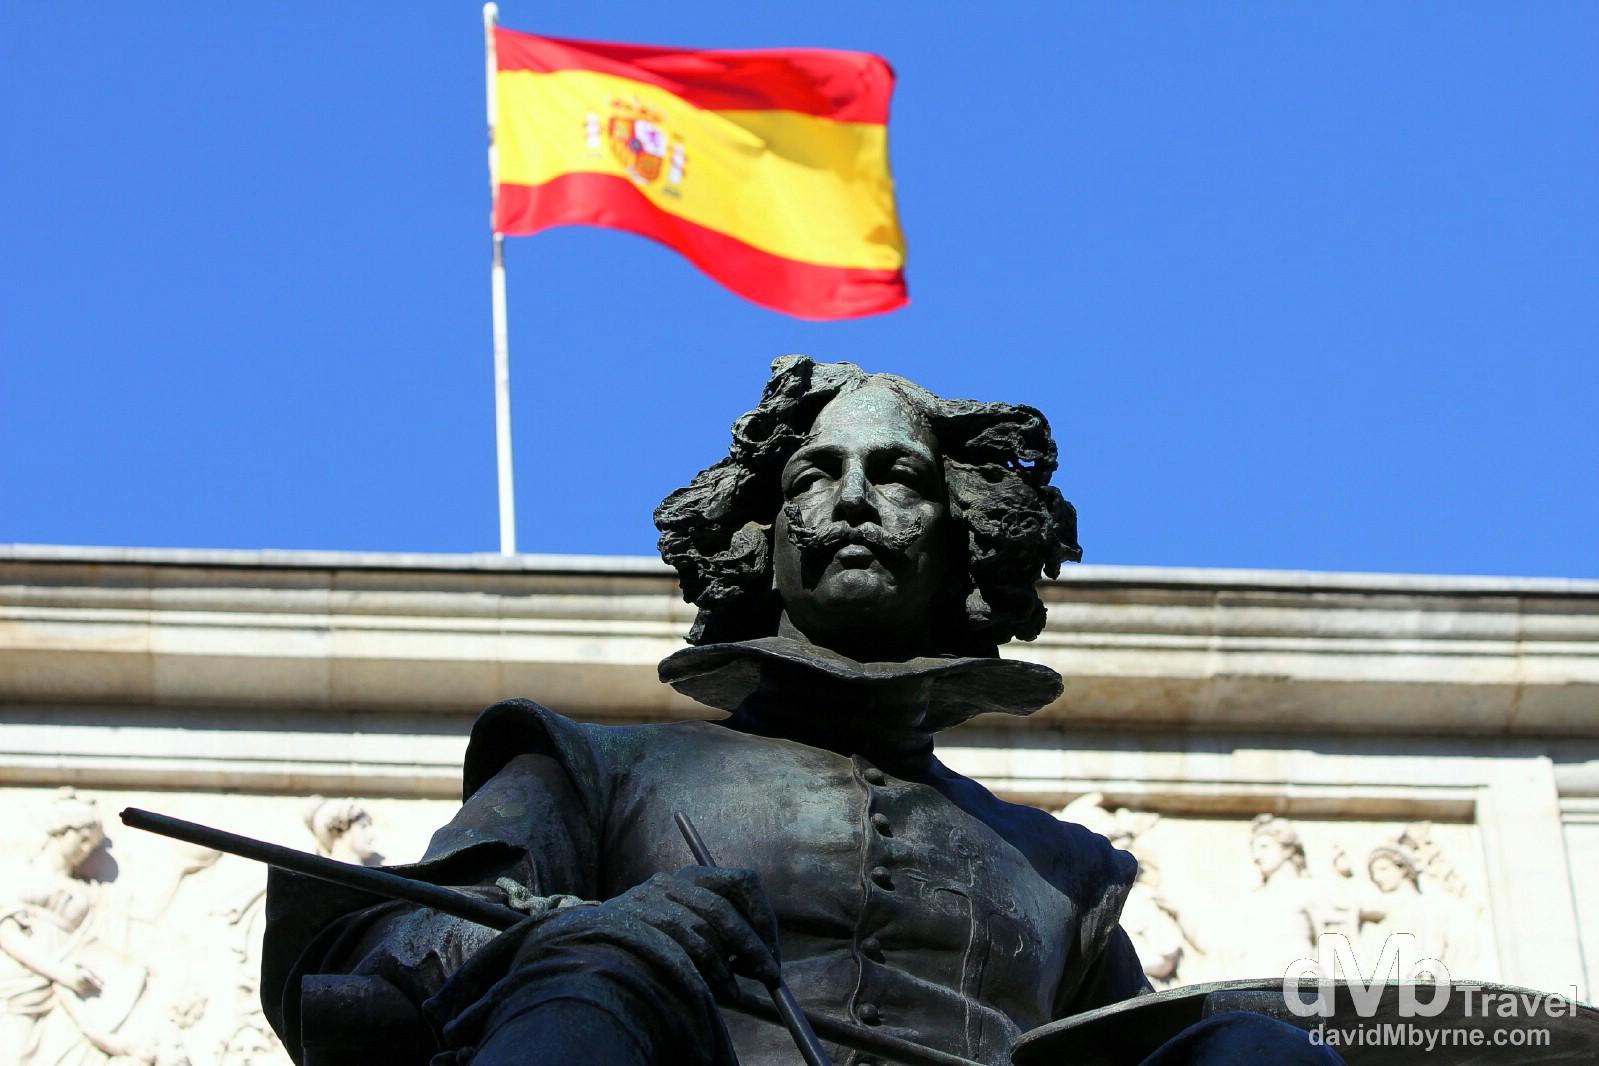 A statue fronting the Museo Nacional del Prado in Madrid, Spain. June 14th, 2014.